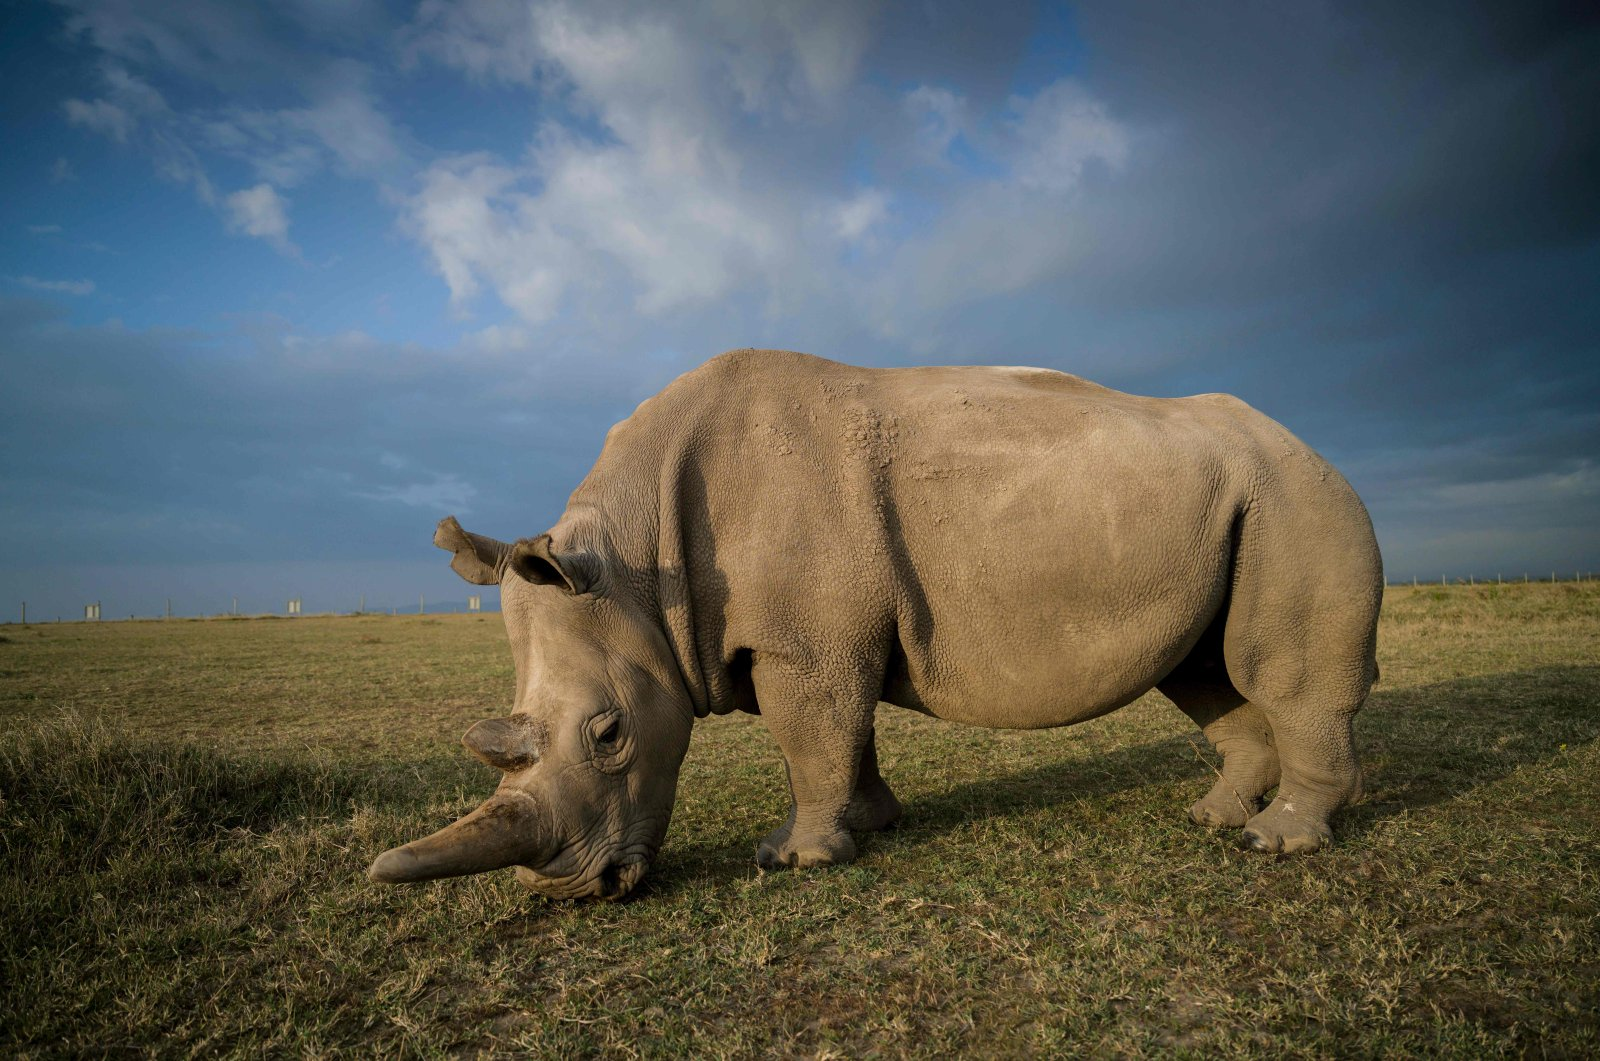 A northern white female rhino called Najin, 30, at the Ol Pejeta Conservancy, central Kenya, Aug. 21, 2019. (Ol Pejeta Conservancy / AFP Photo)